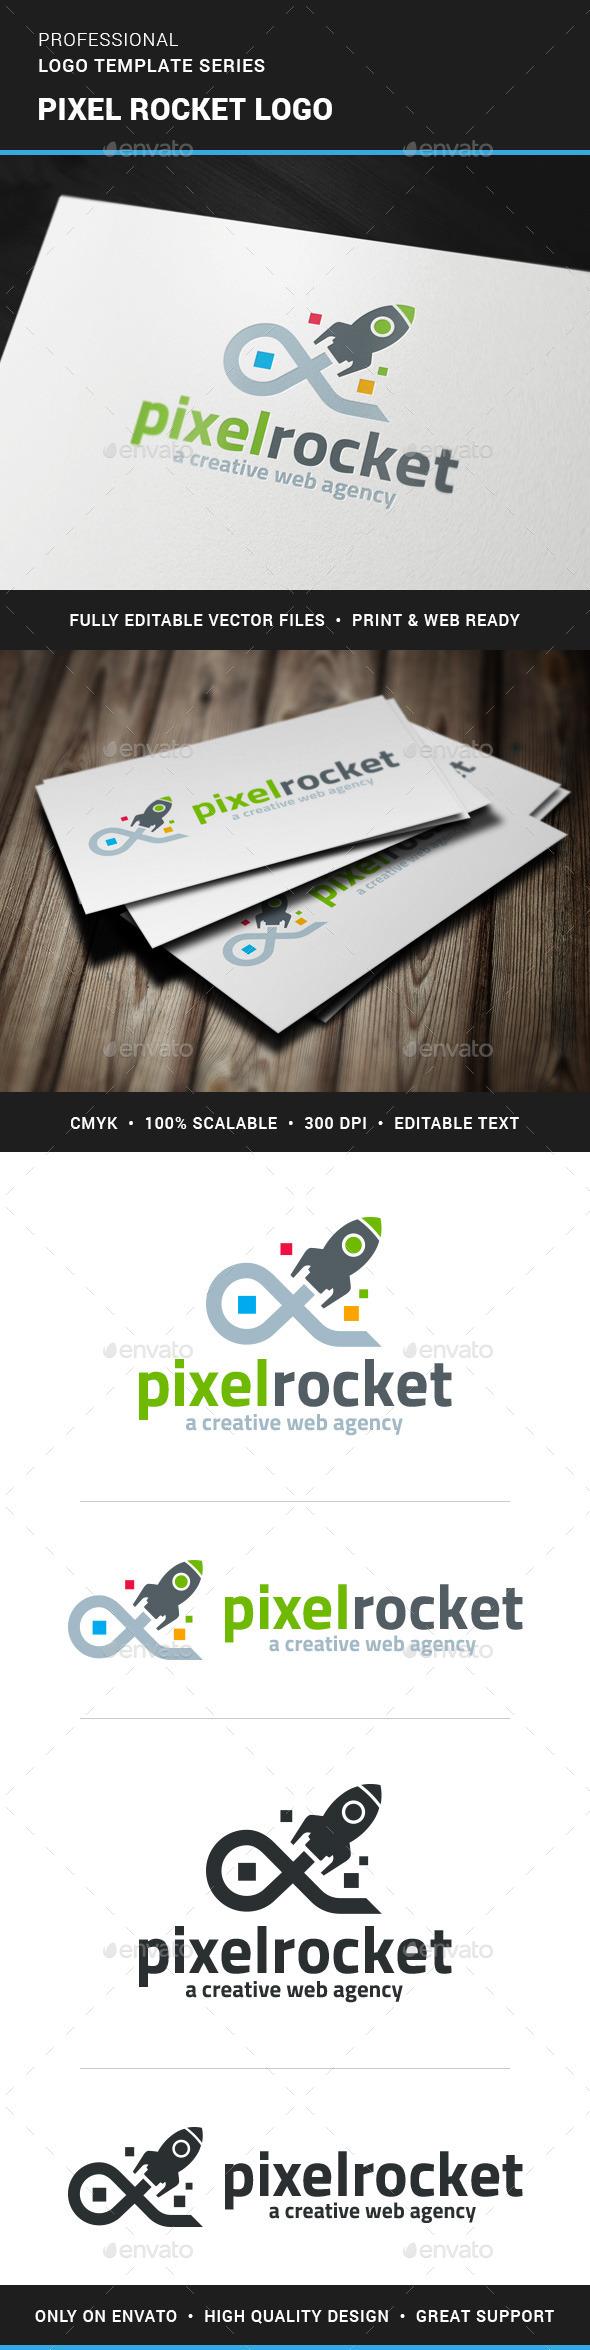 Pixel Rocket Logo Template - Objects Logo Templates